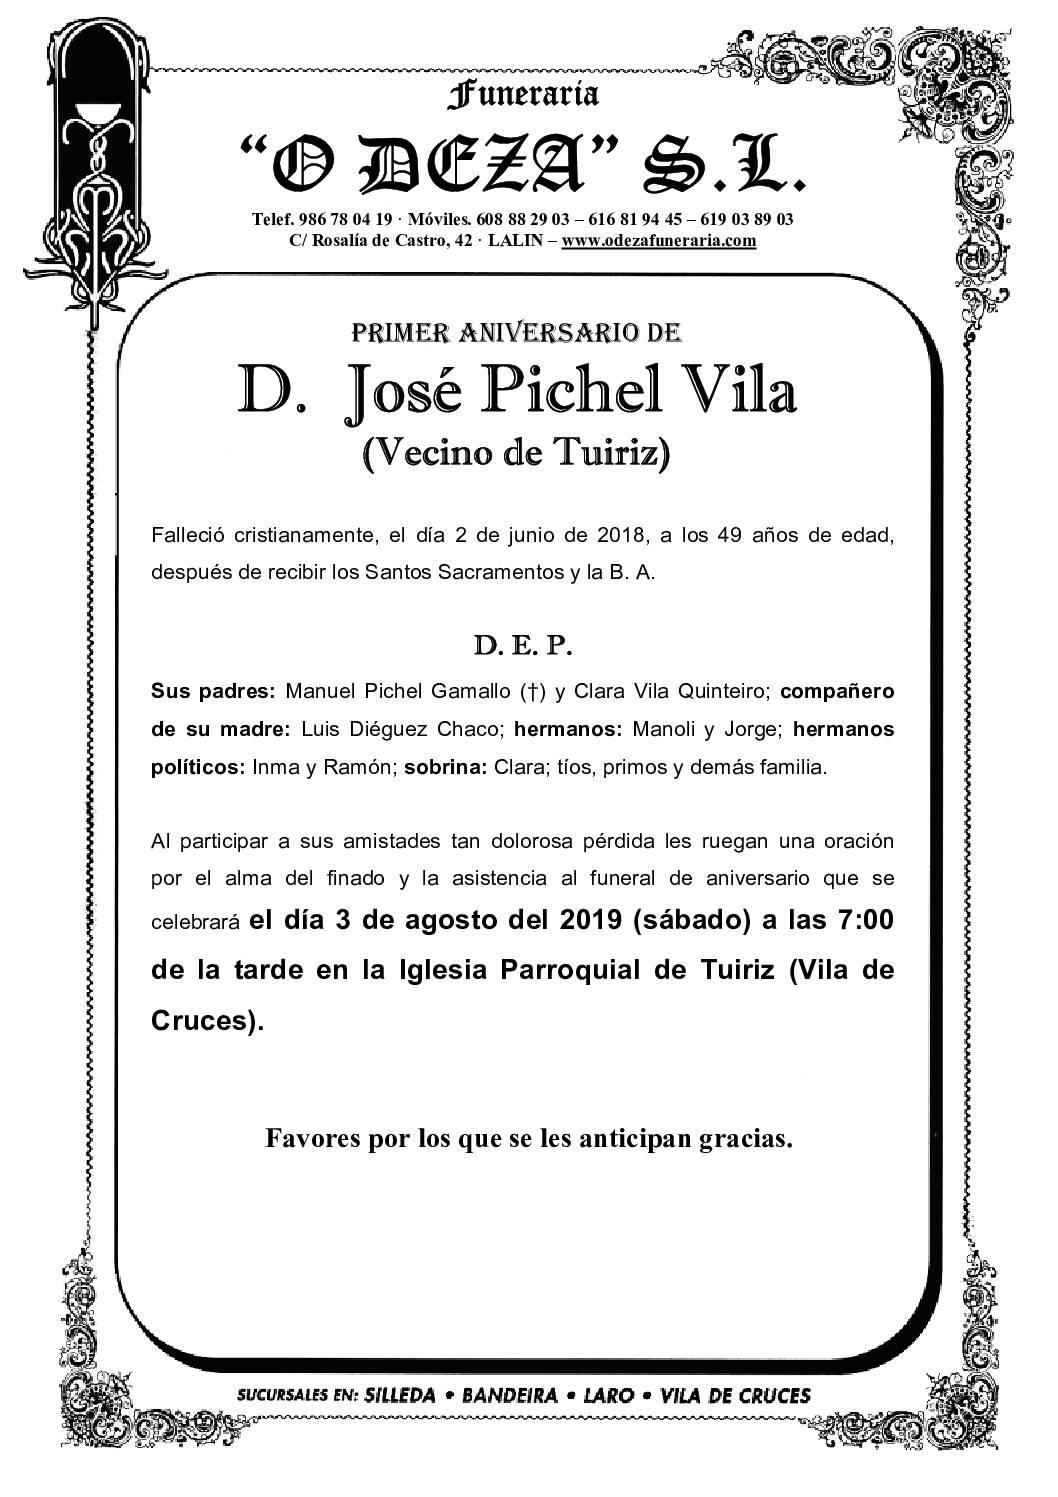 D. JOSÉ PICHEL VILA